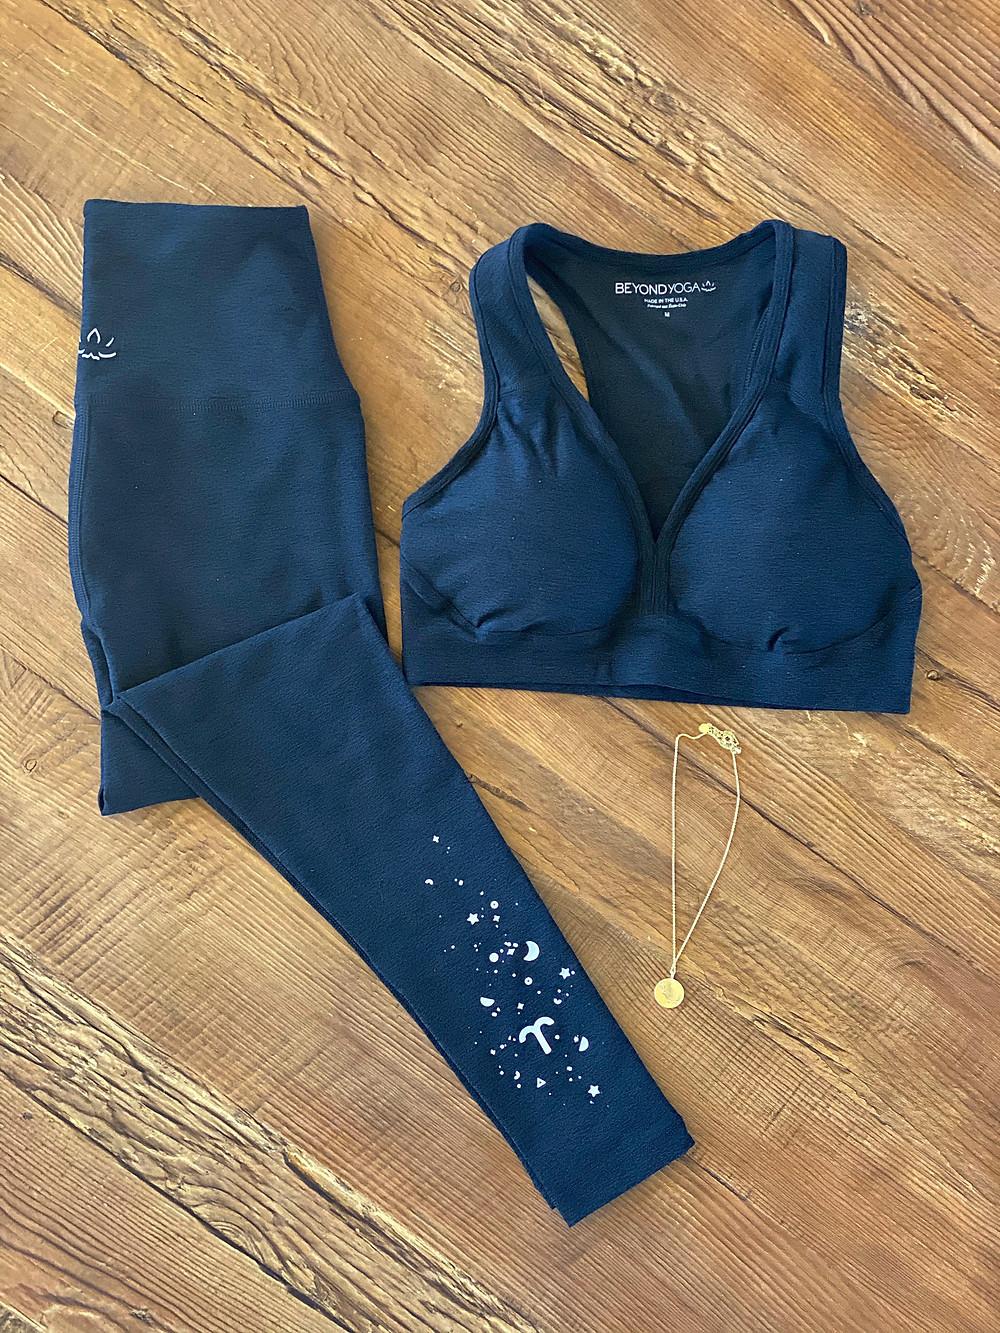 Yoga Fashion - Best Bra & Legging Sets 2021 - Beyond Yoga Spacedye Zodiac Leggings & Lift Your Spirits Bra